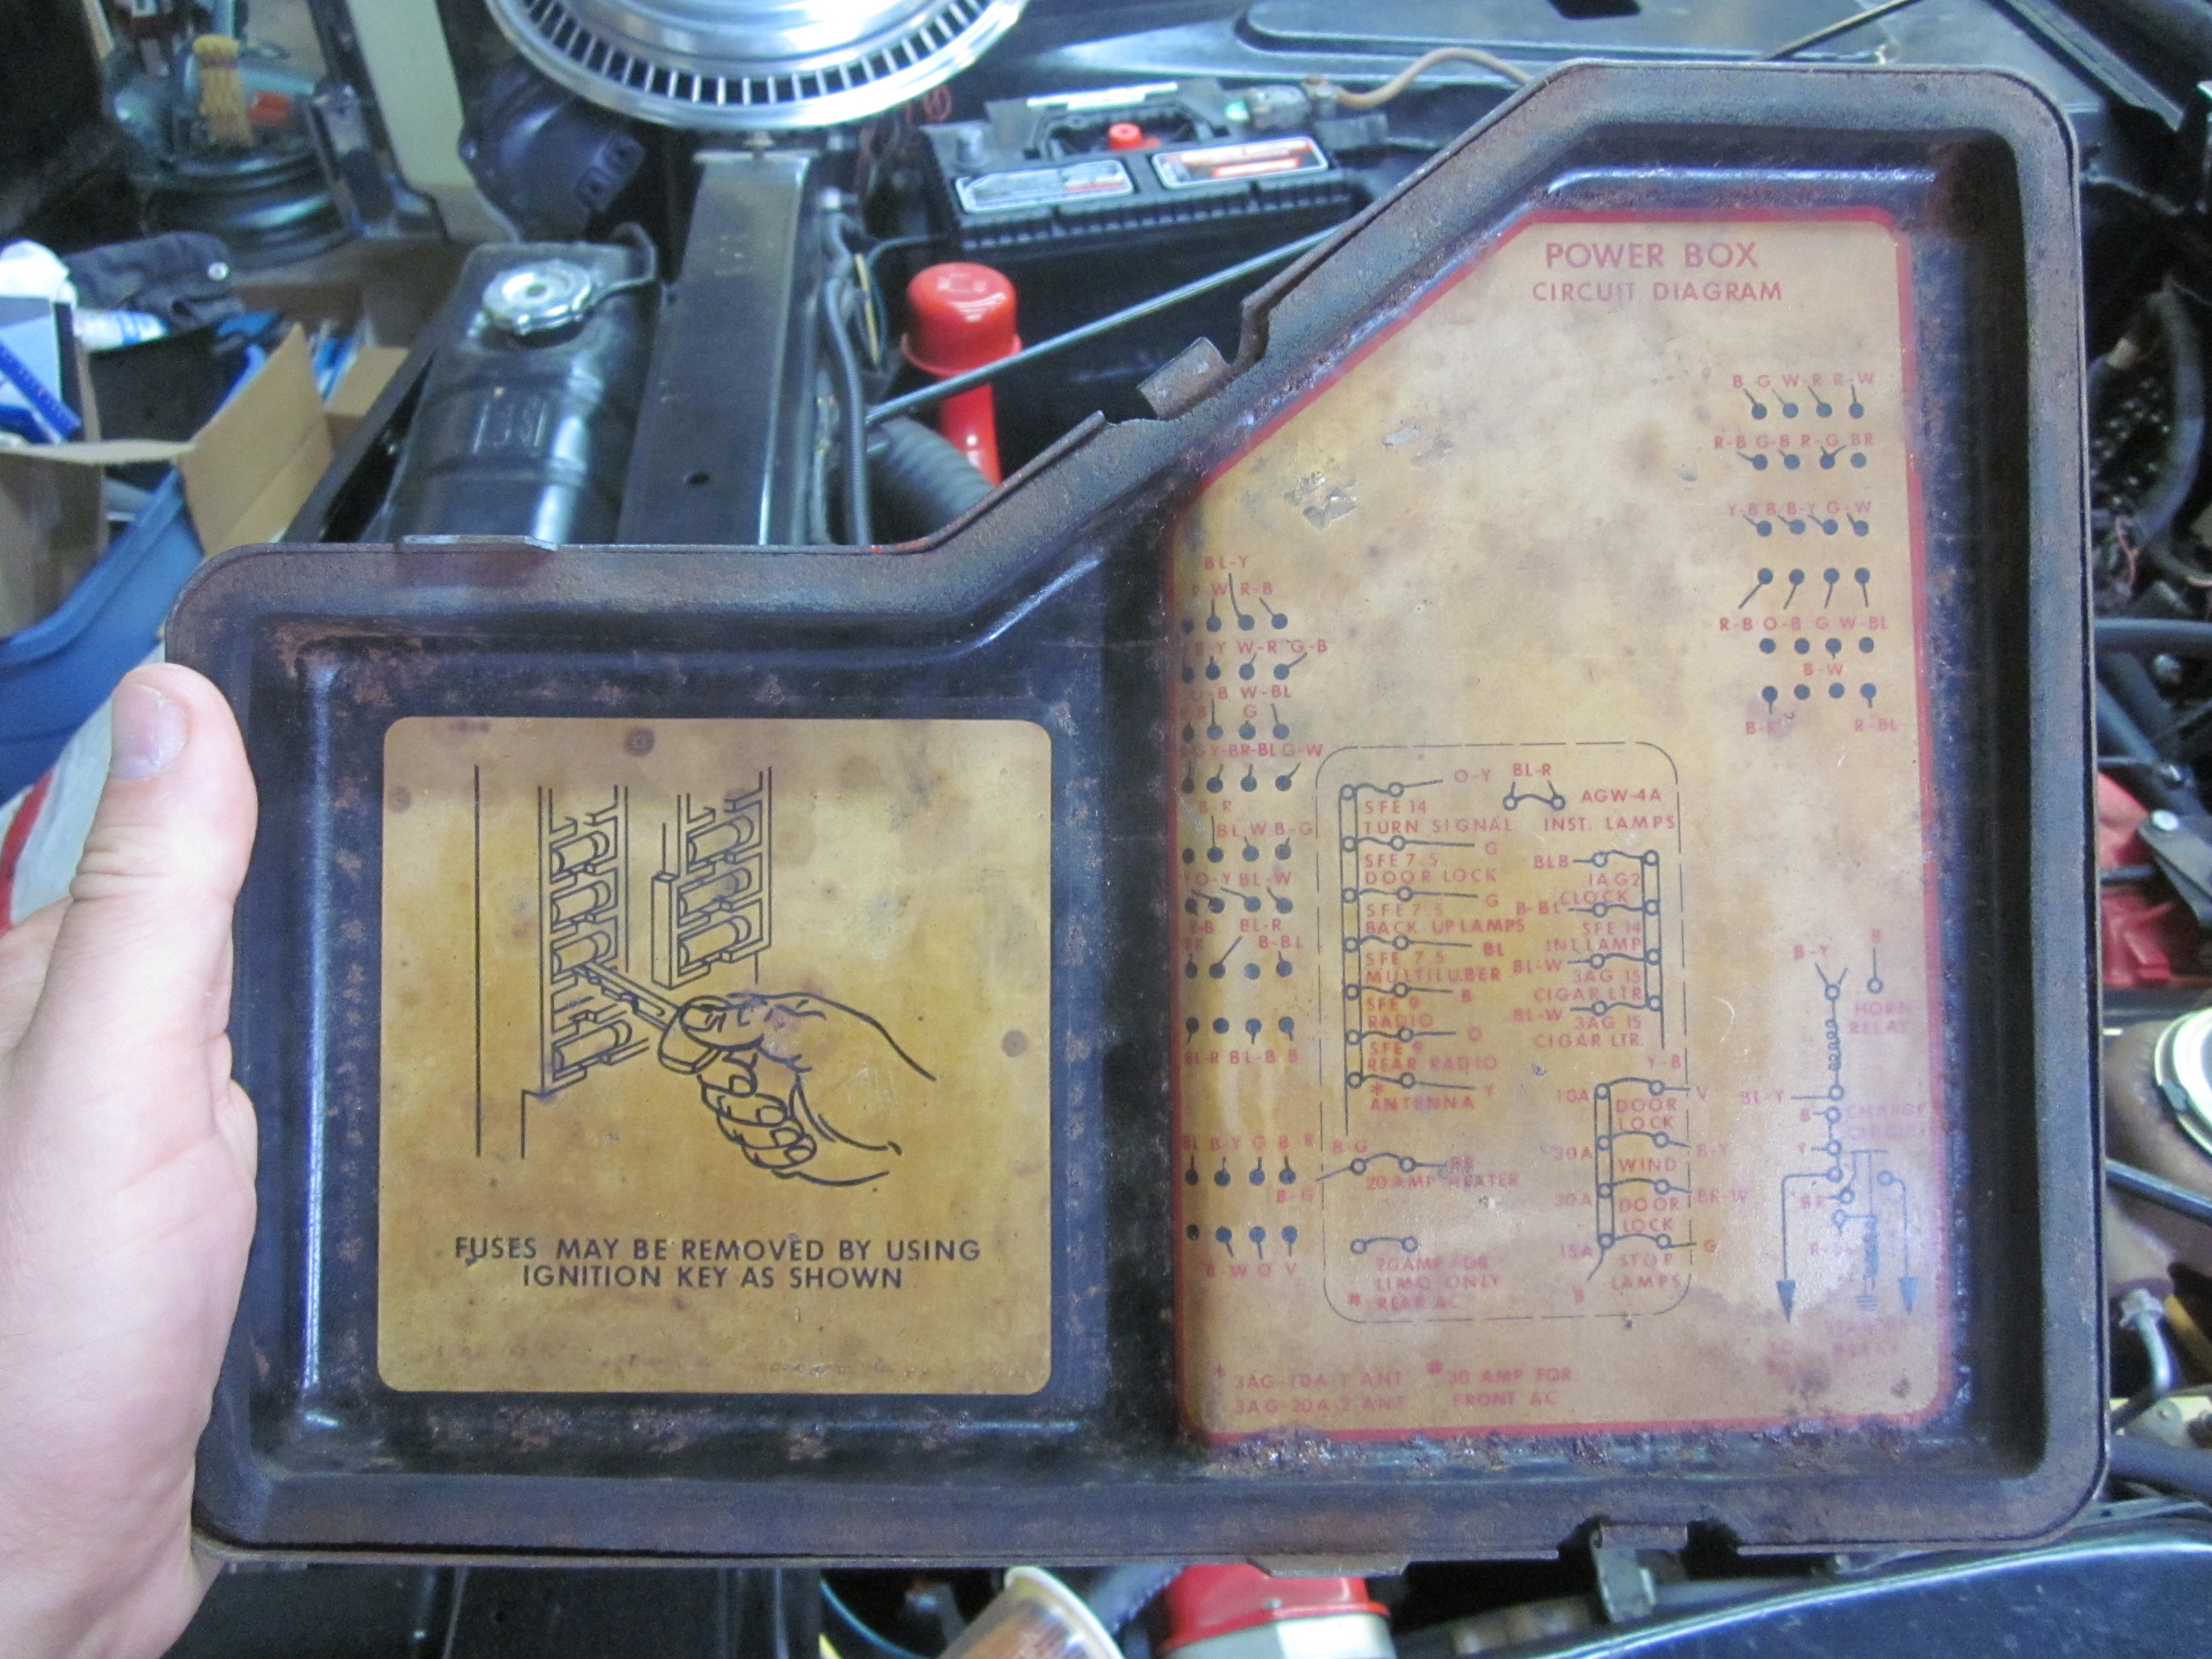 Chevy Wiper Motor Wiring Diagram Additionally 1973 Camaro Fuse Box